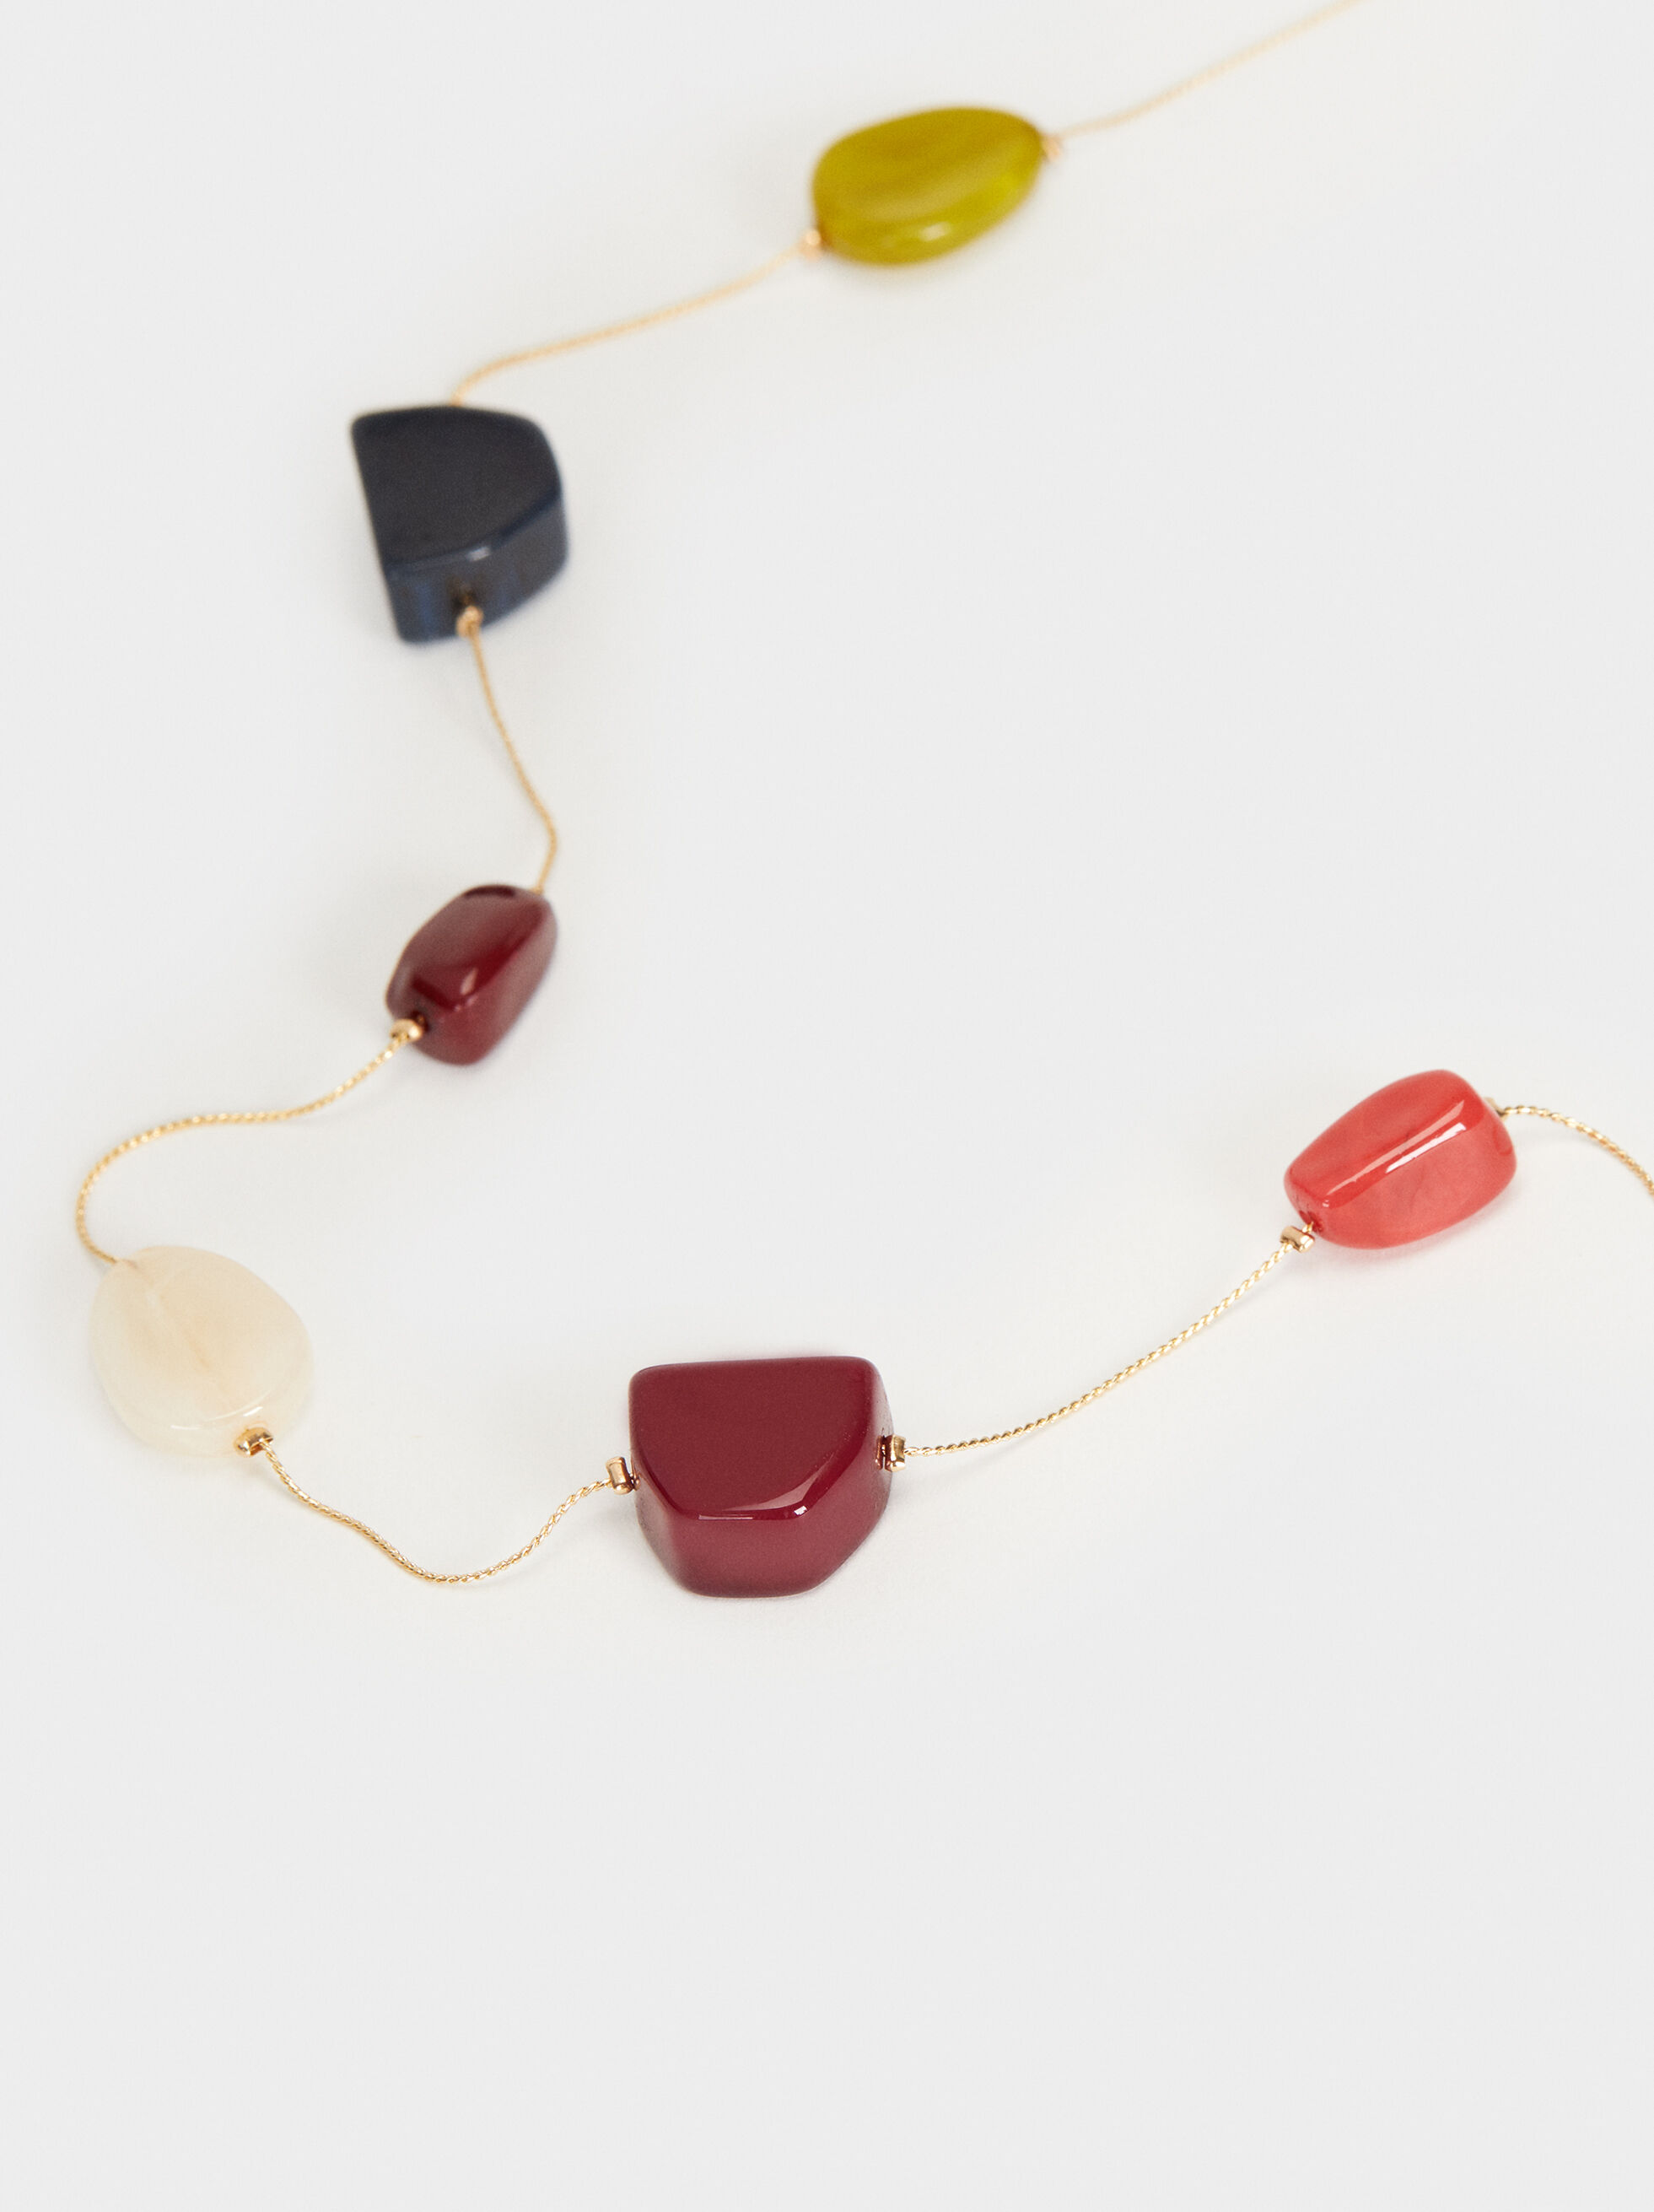 Wild Color Long Pendant Necklace, Multicolor, hi-res